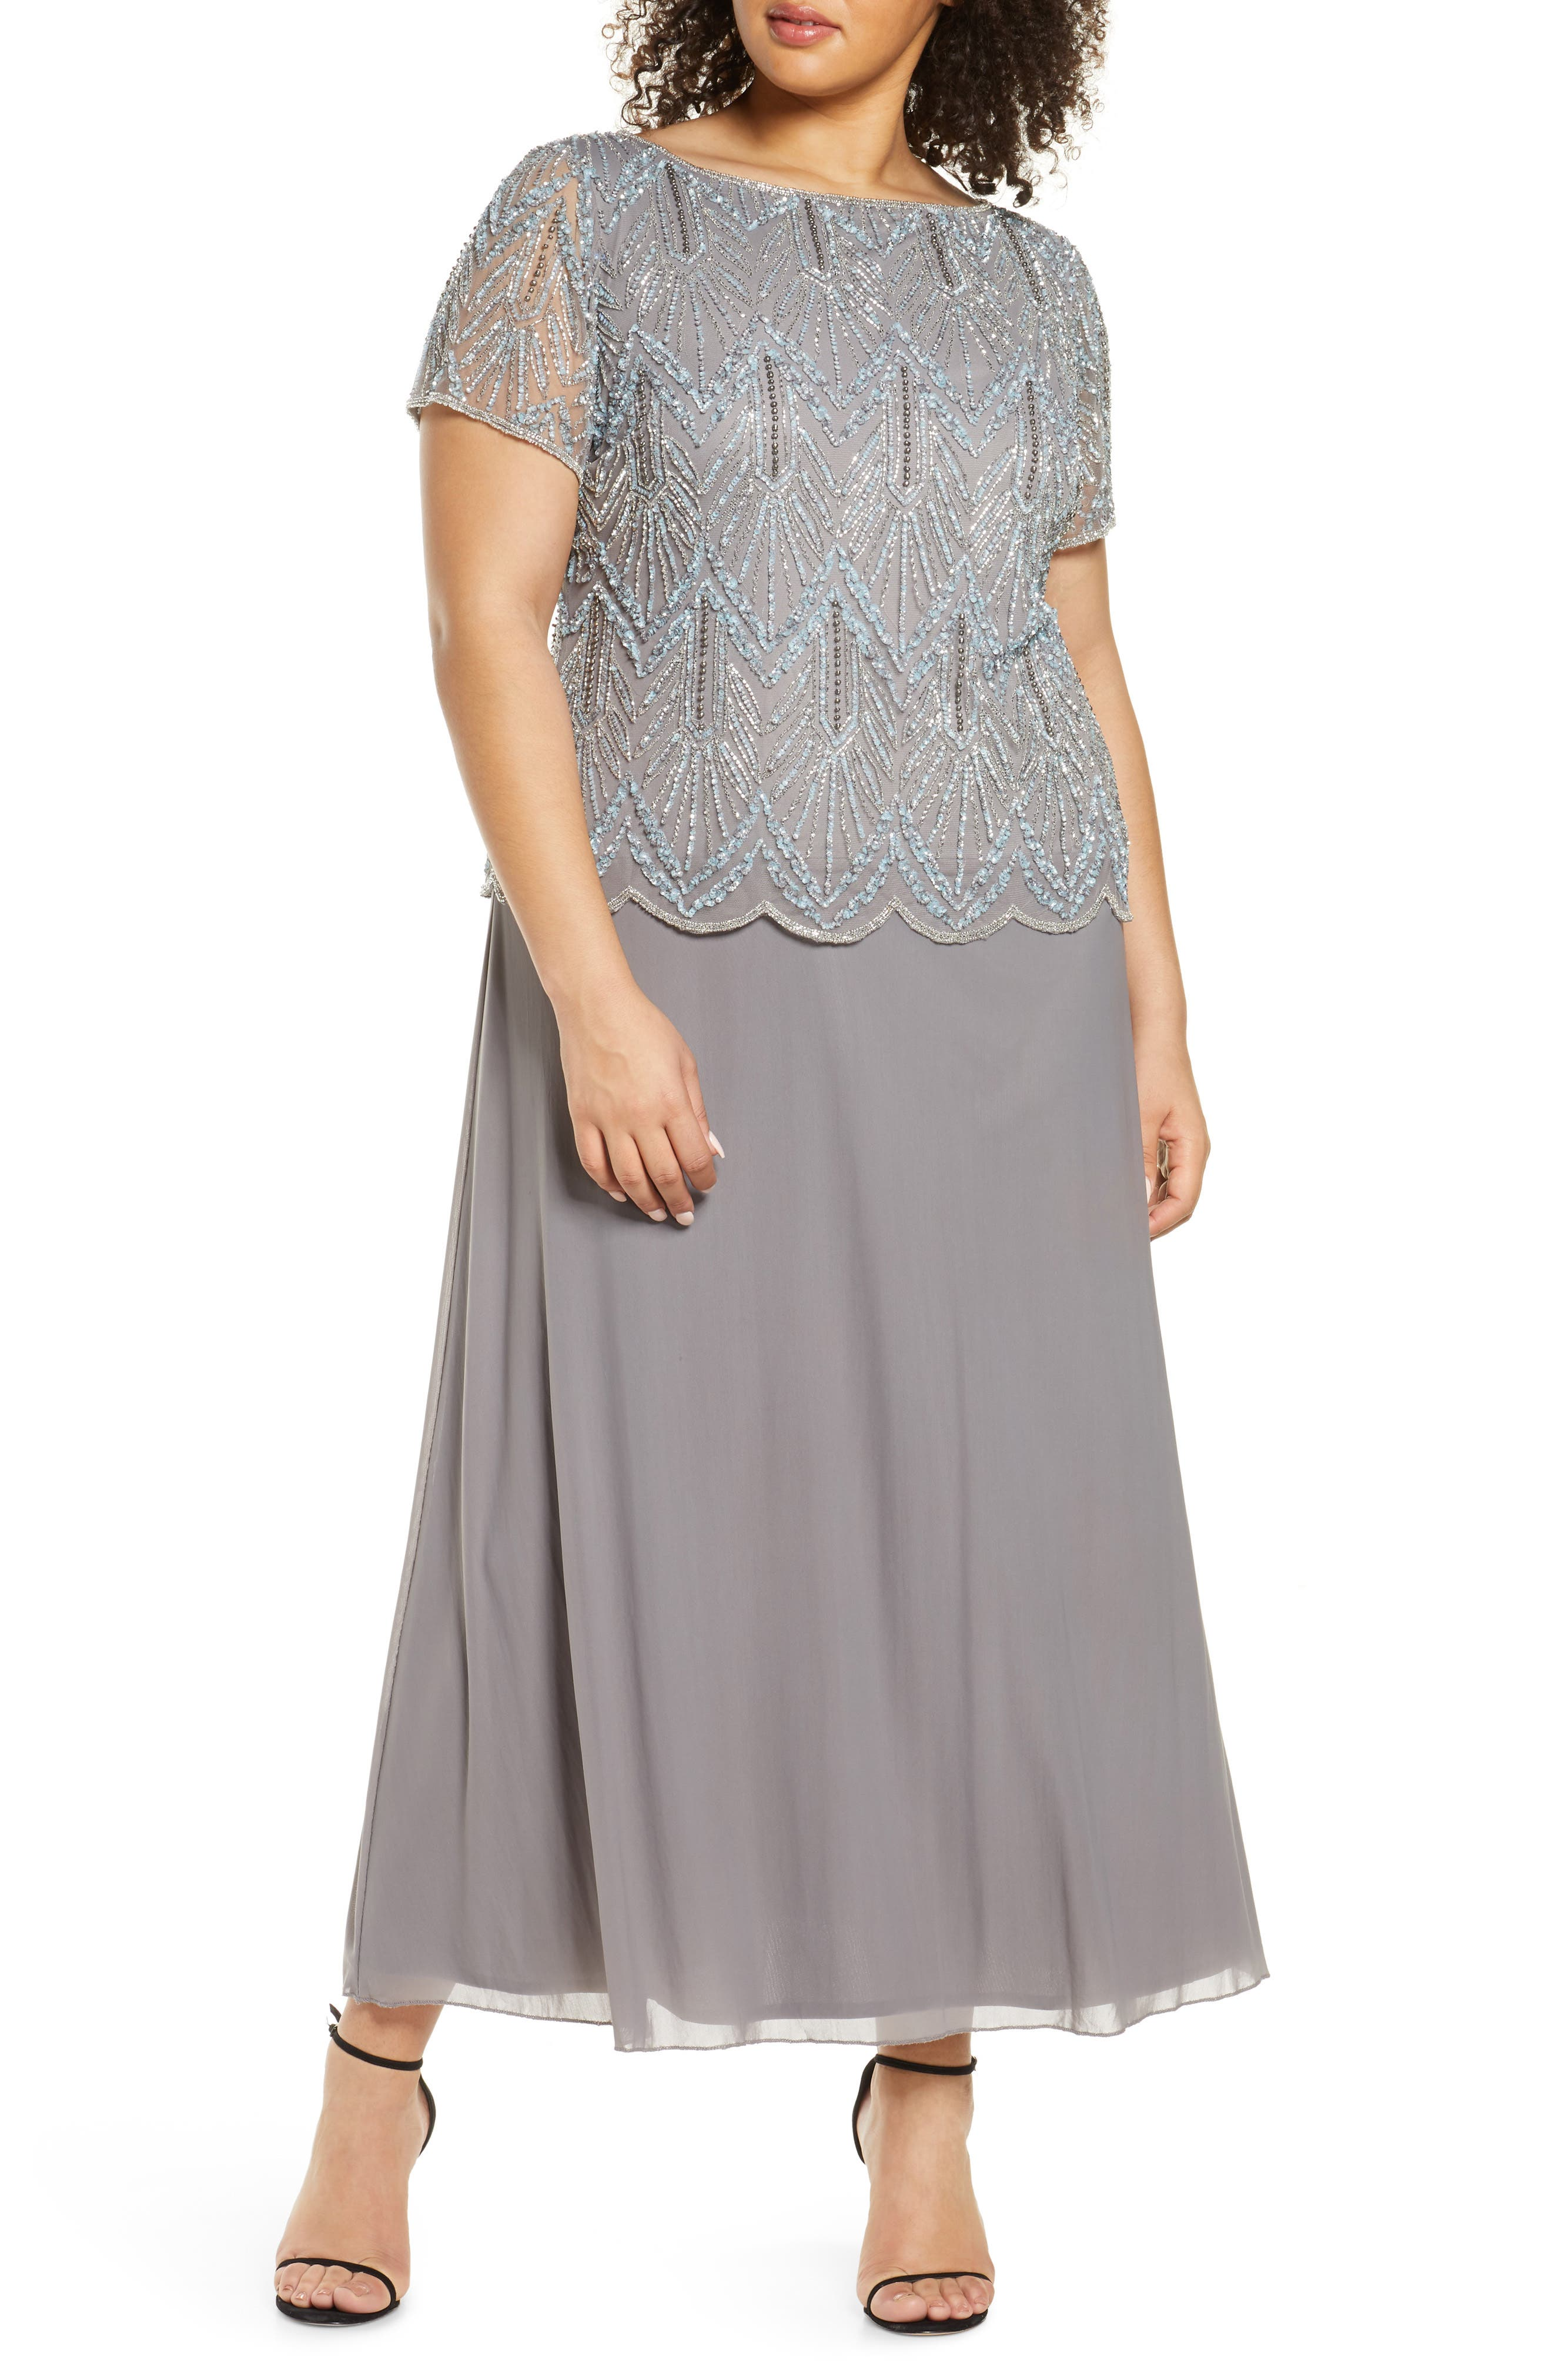 1920s Plus Size Flapper Dresses, Gatsby Dresses, Flapper Costumes Plus Size Womens Pisarro Nights Mock Two-Piece Beaded Bodice Evening Dress $142.80 AT vintagedancer.com